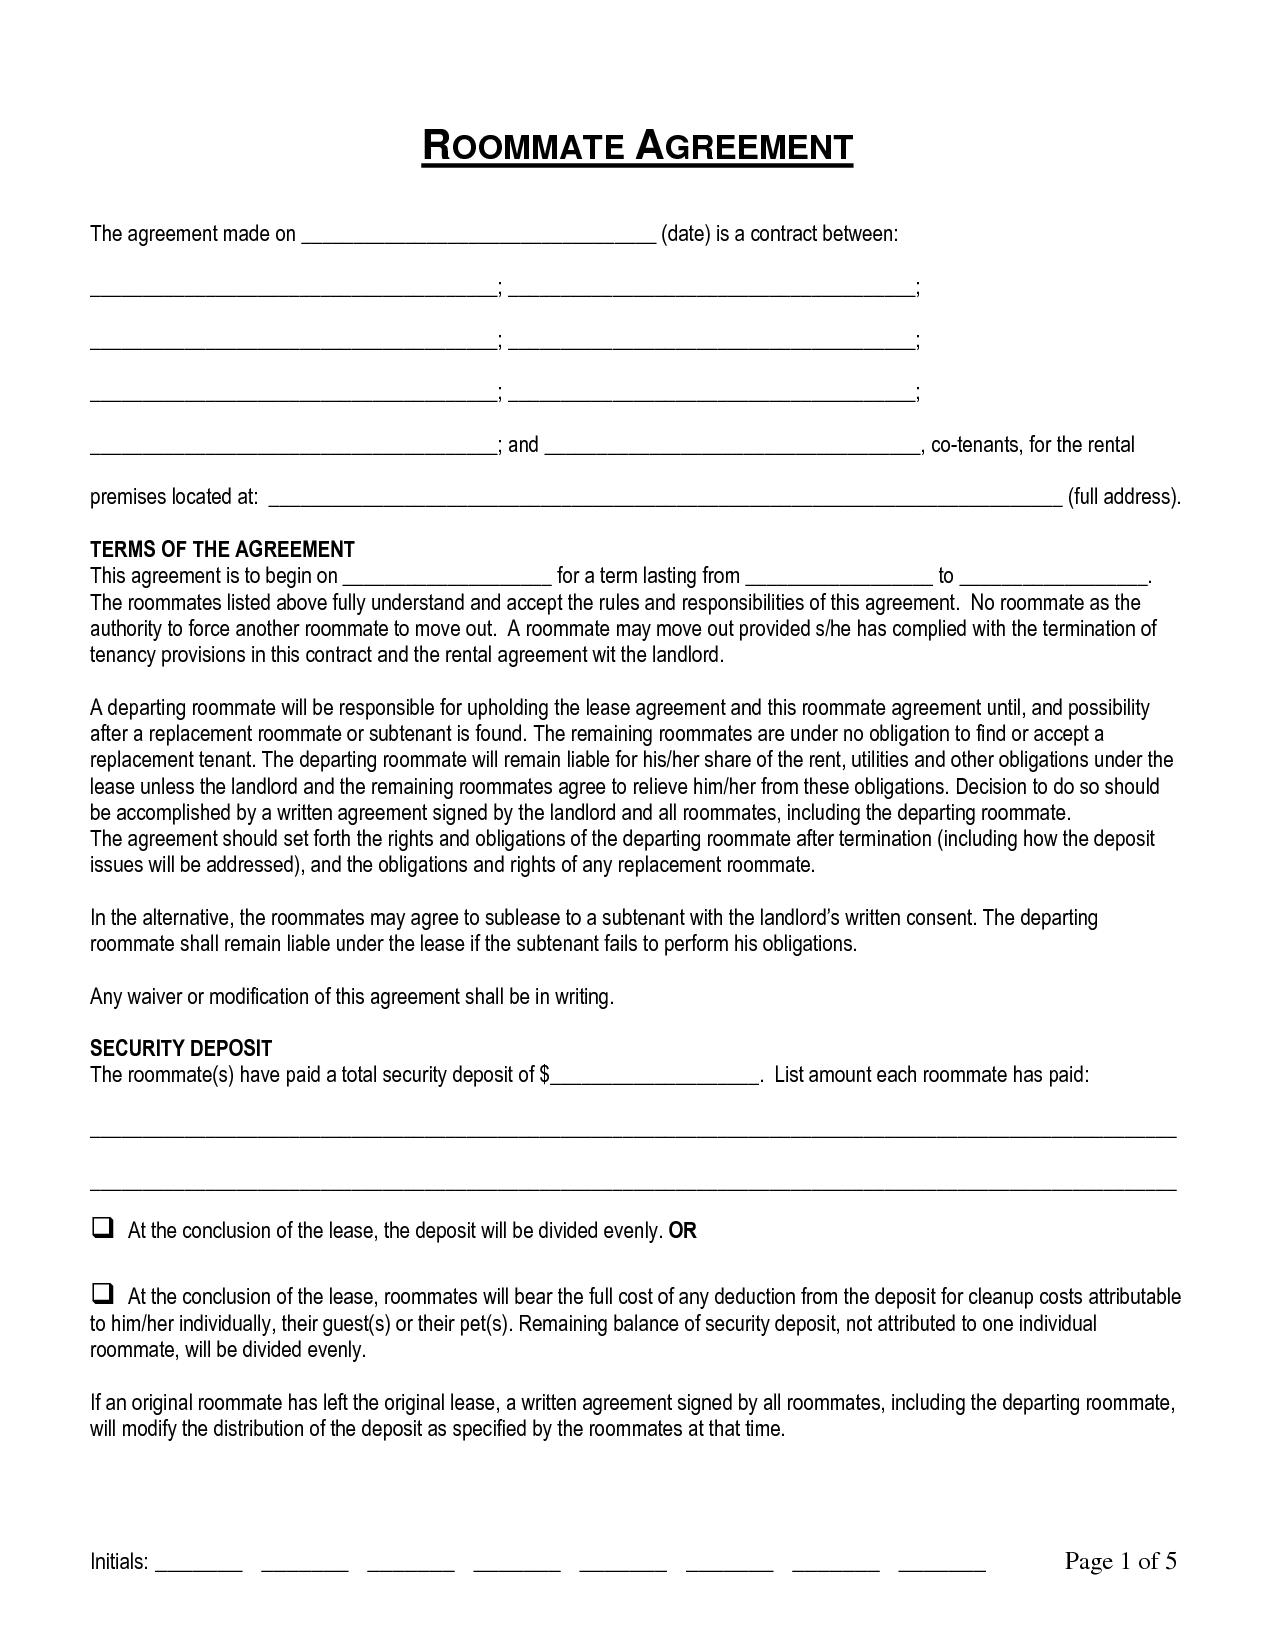 isro application form after 10 2